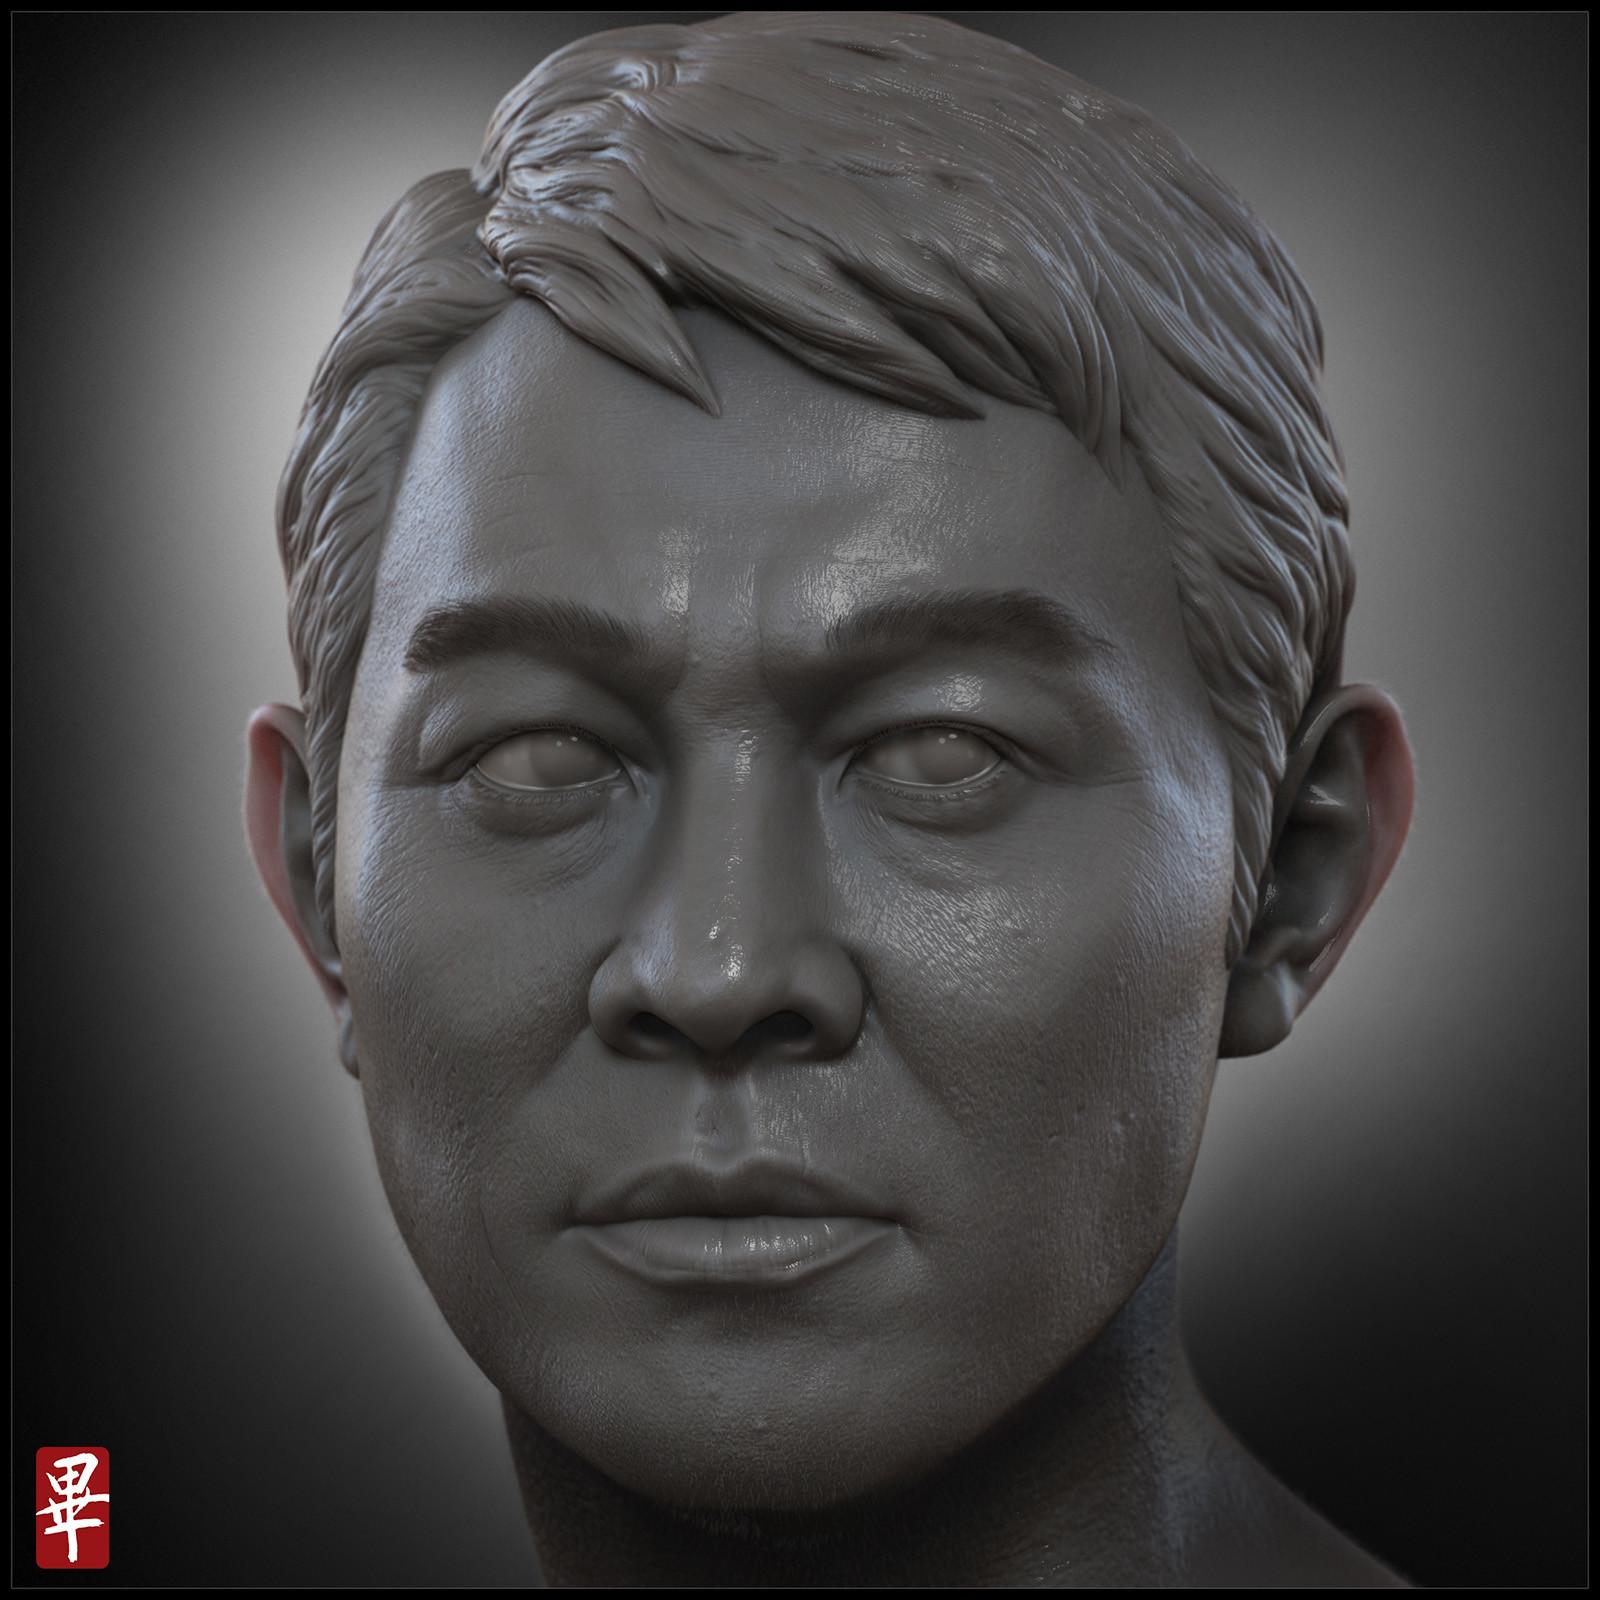 Jet Li's portrait